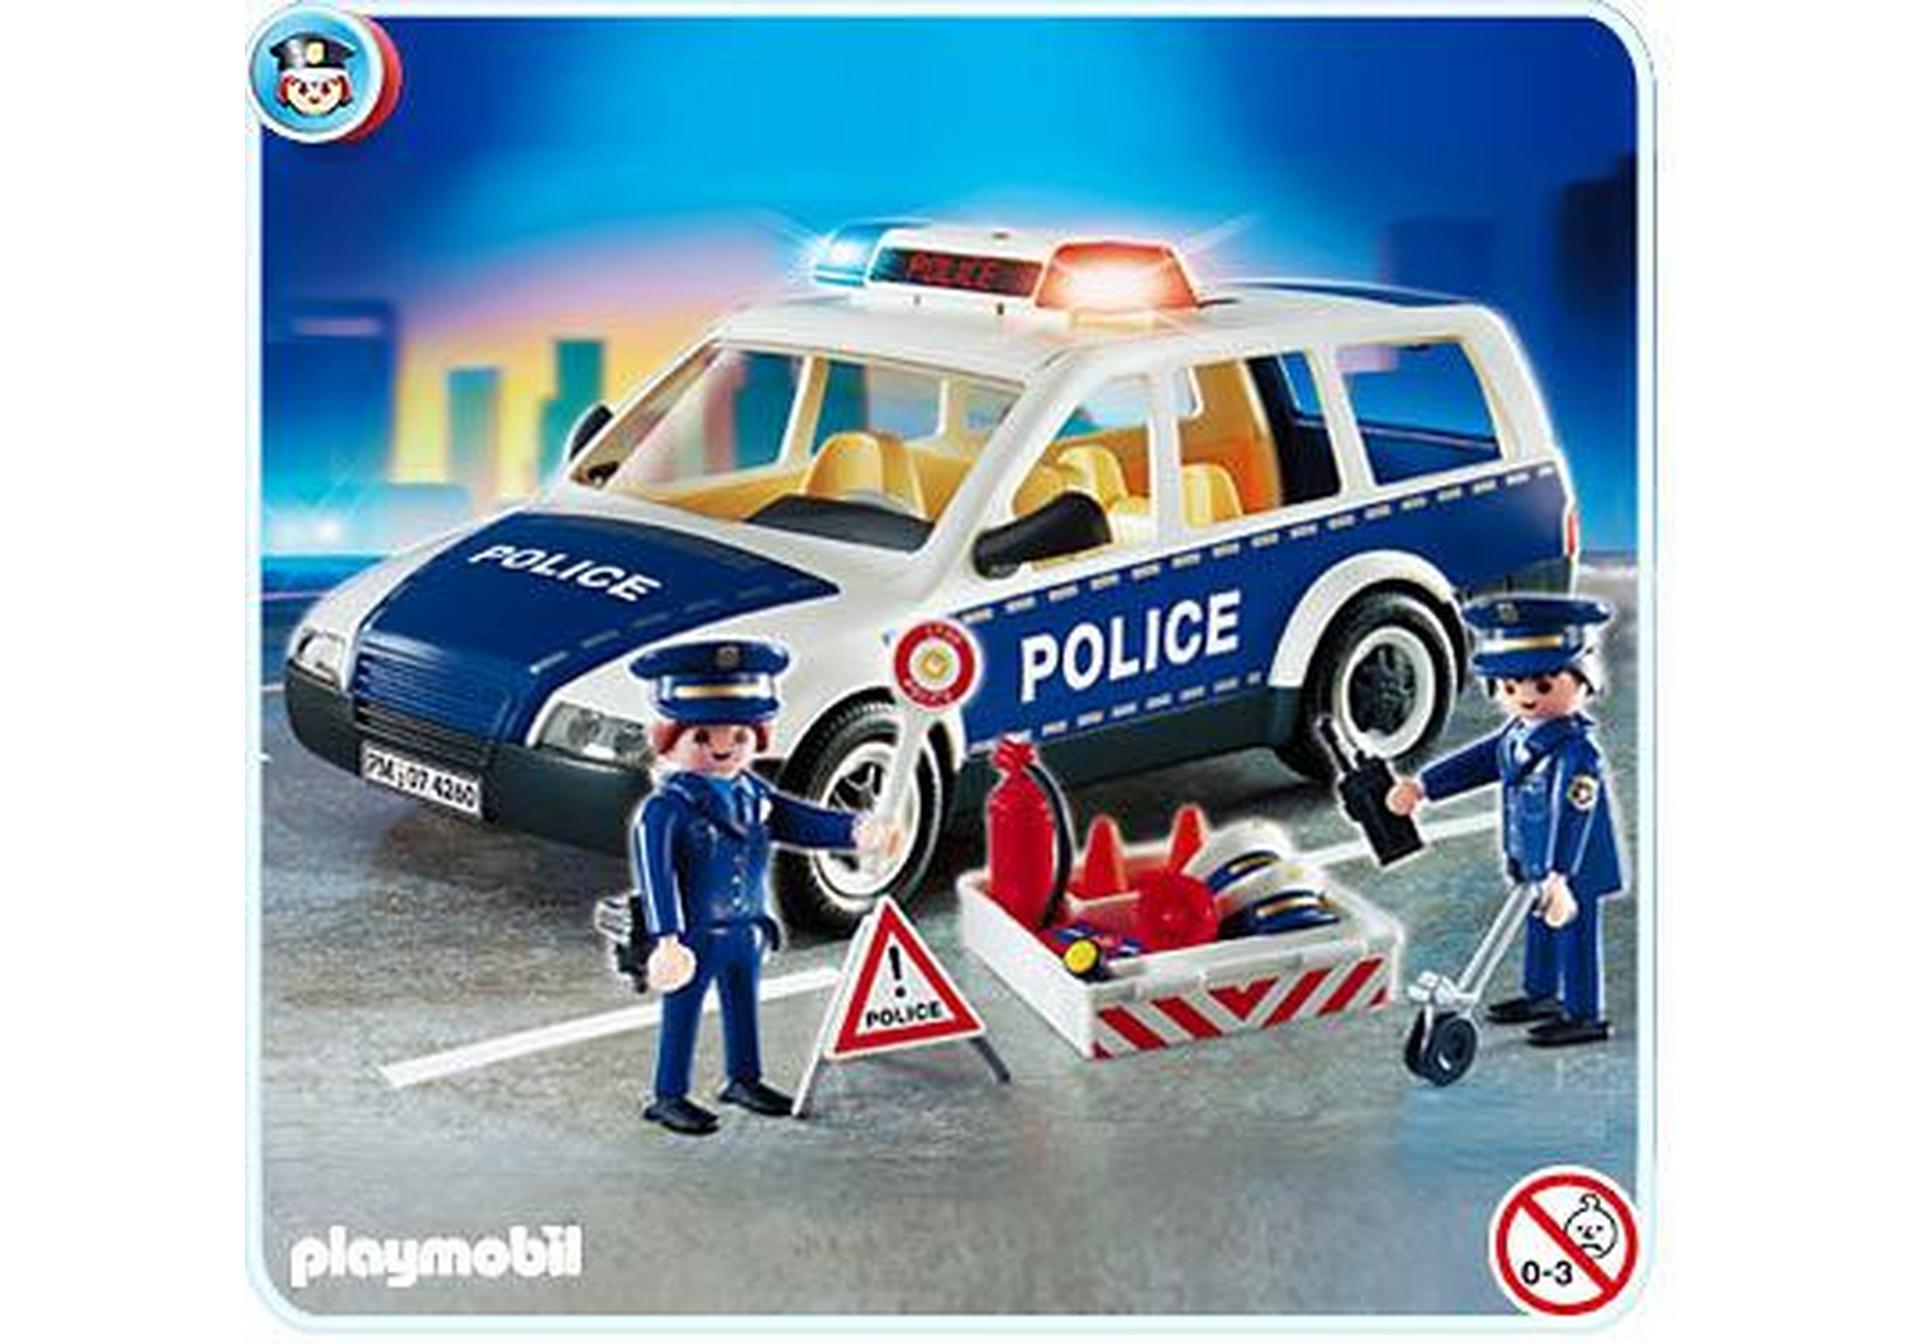 voiture de police et patrouille 4260 a playmobil france. Black Bedroom Furniture Sets. Home Design Ideas